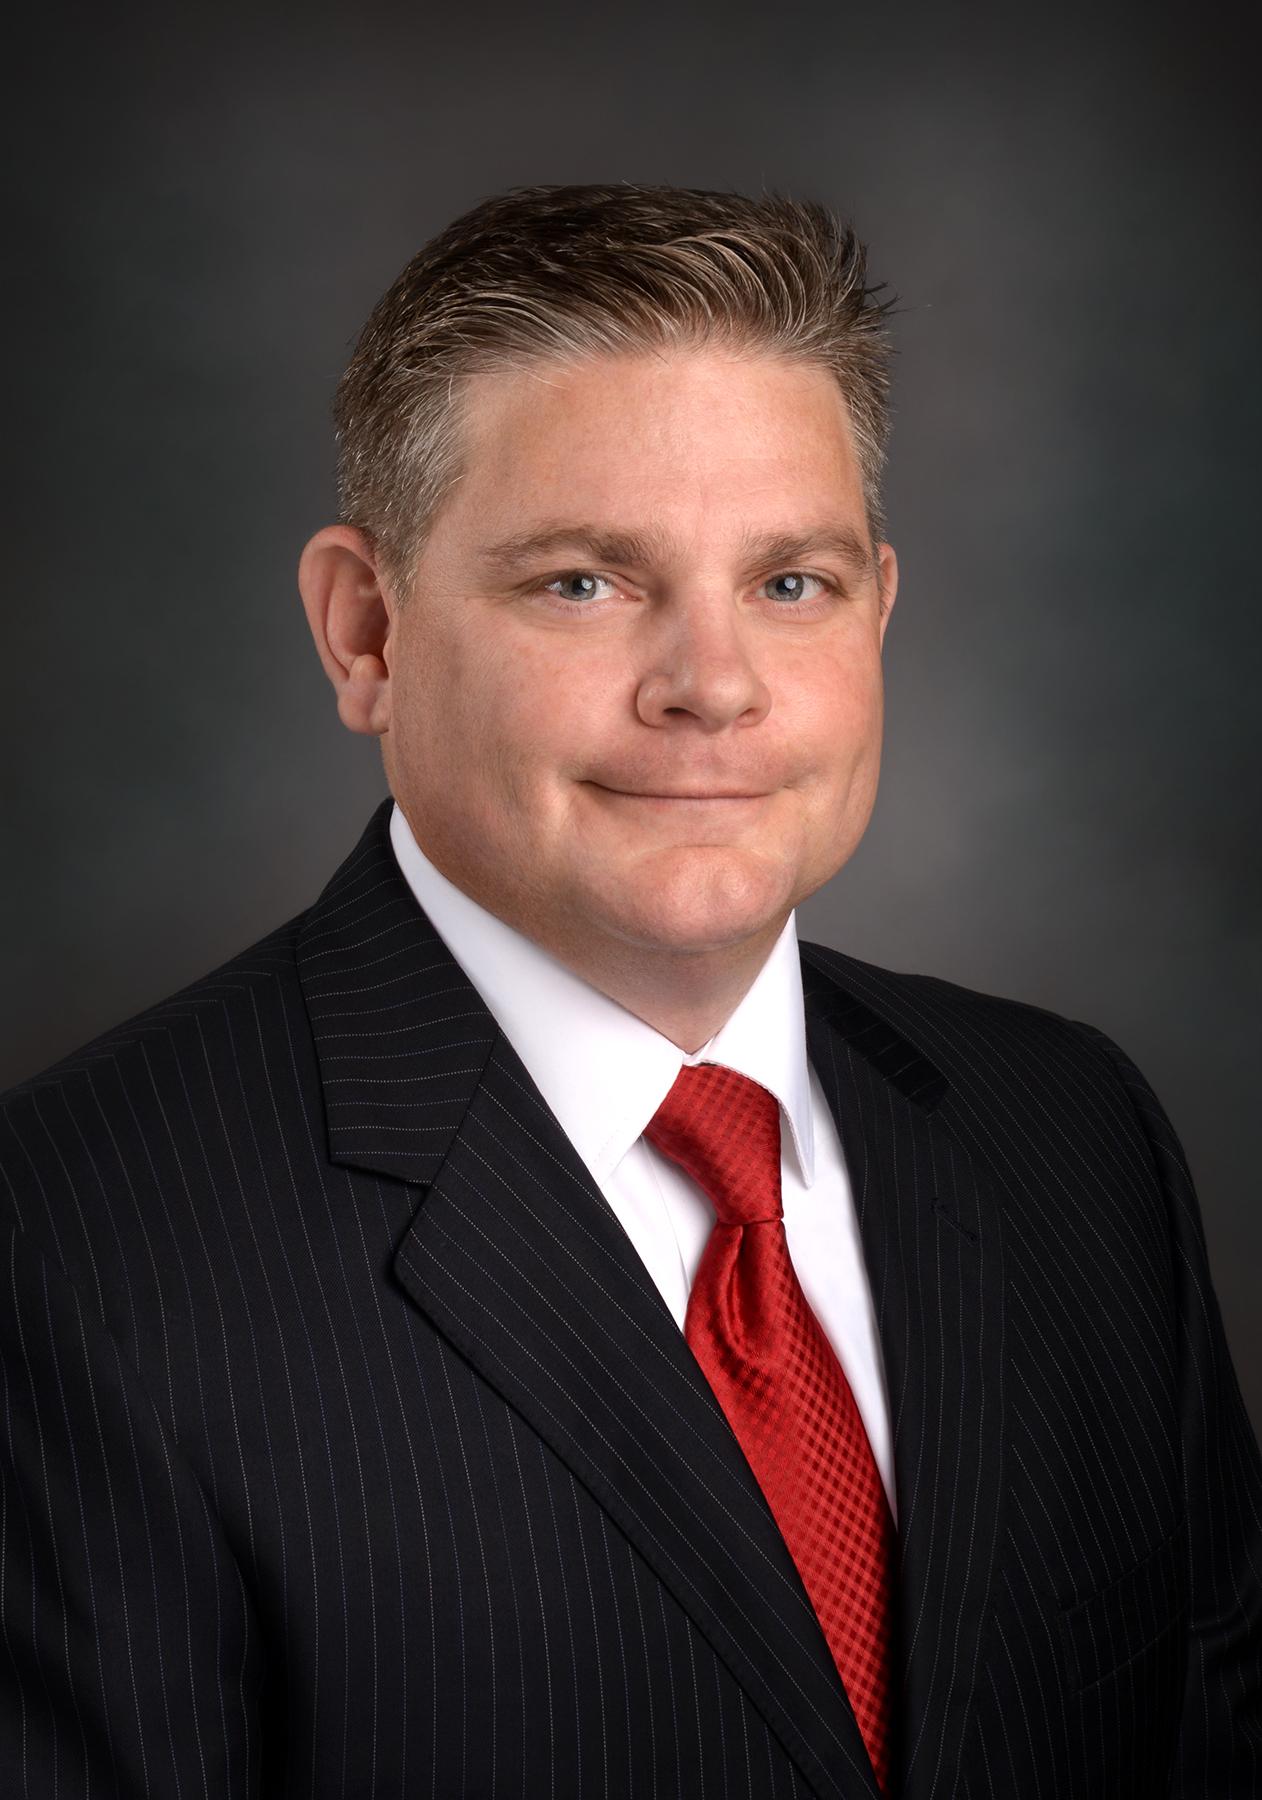 County Administrator Jonathan R. Lewis